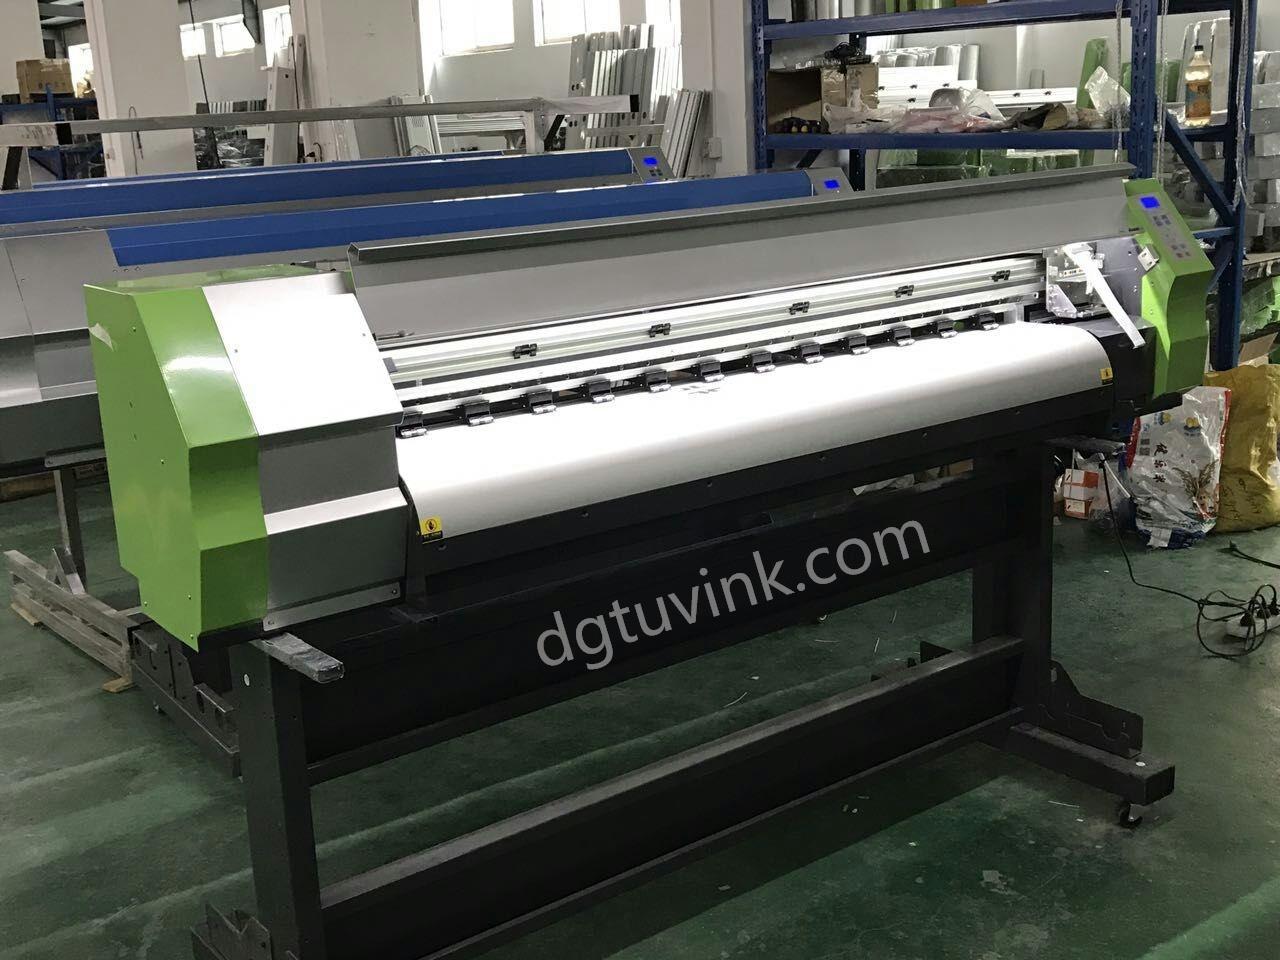 5feet single epsondx5 head vinyl sticker inkjet printer